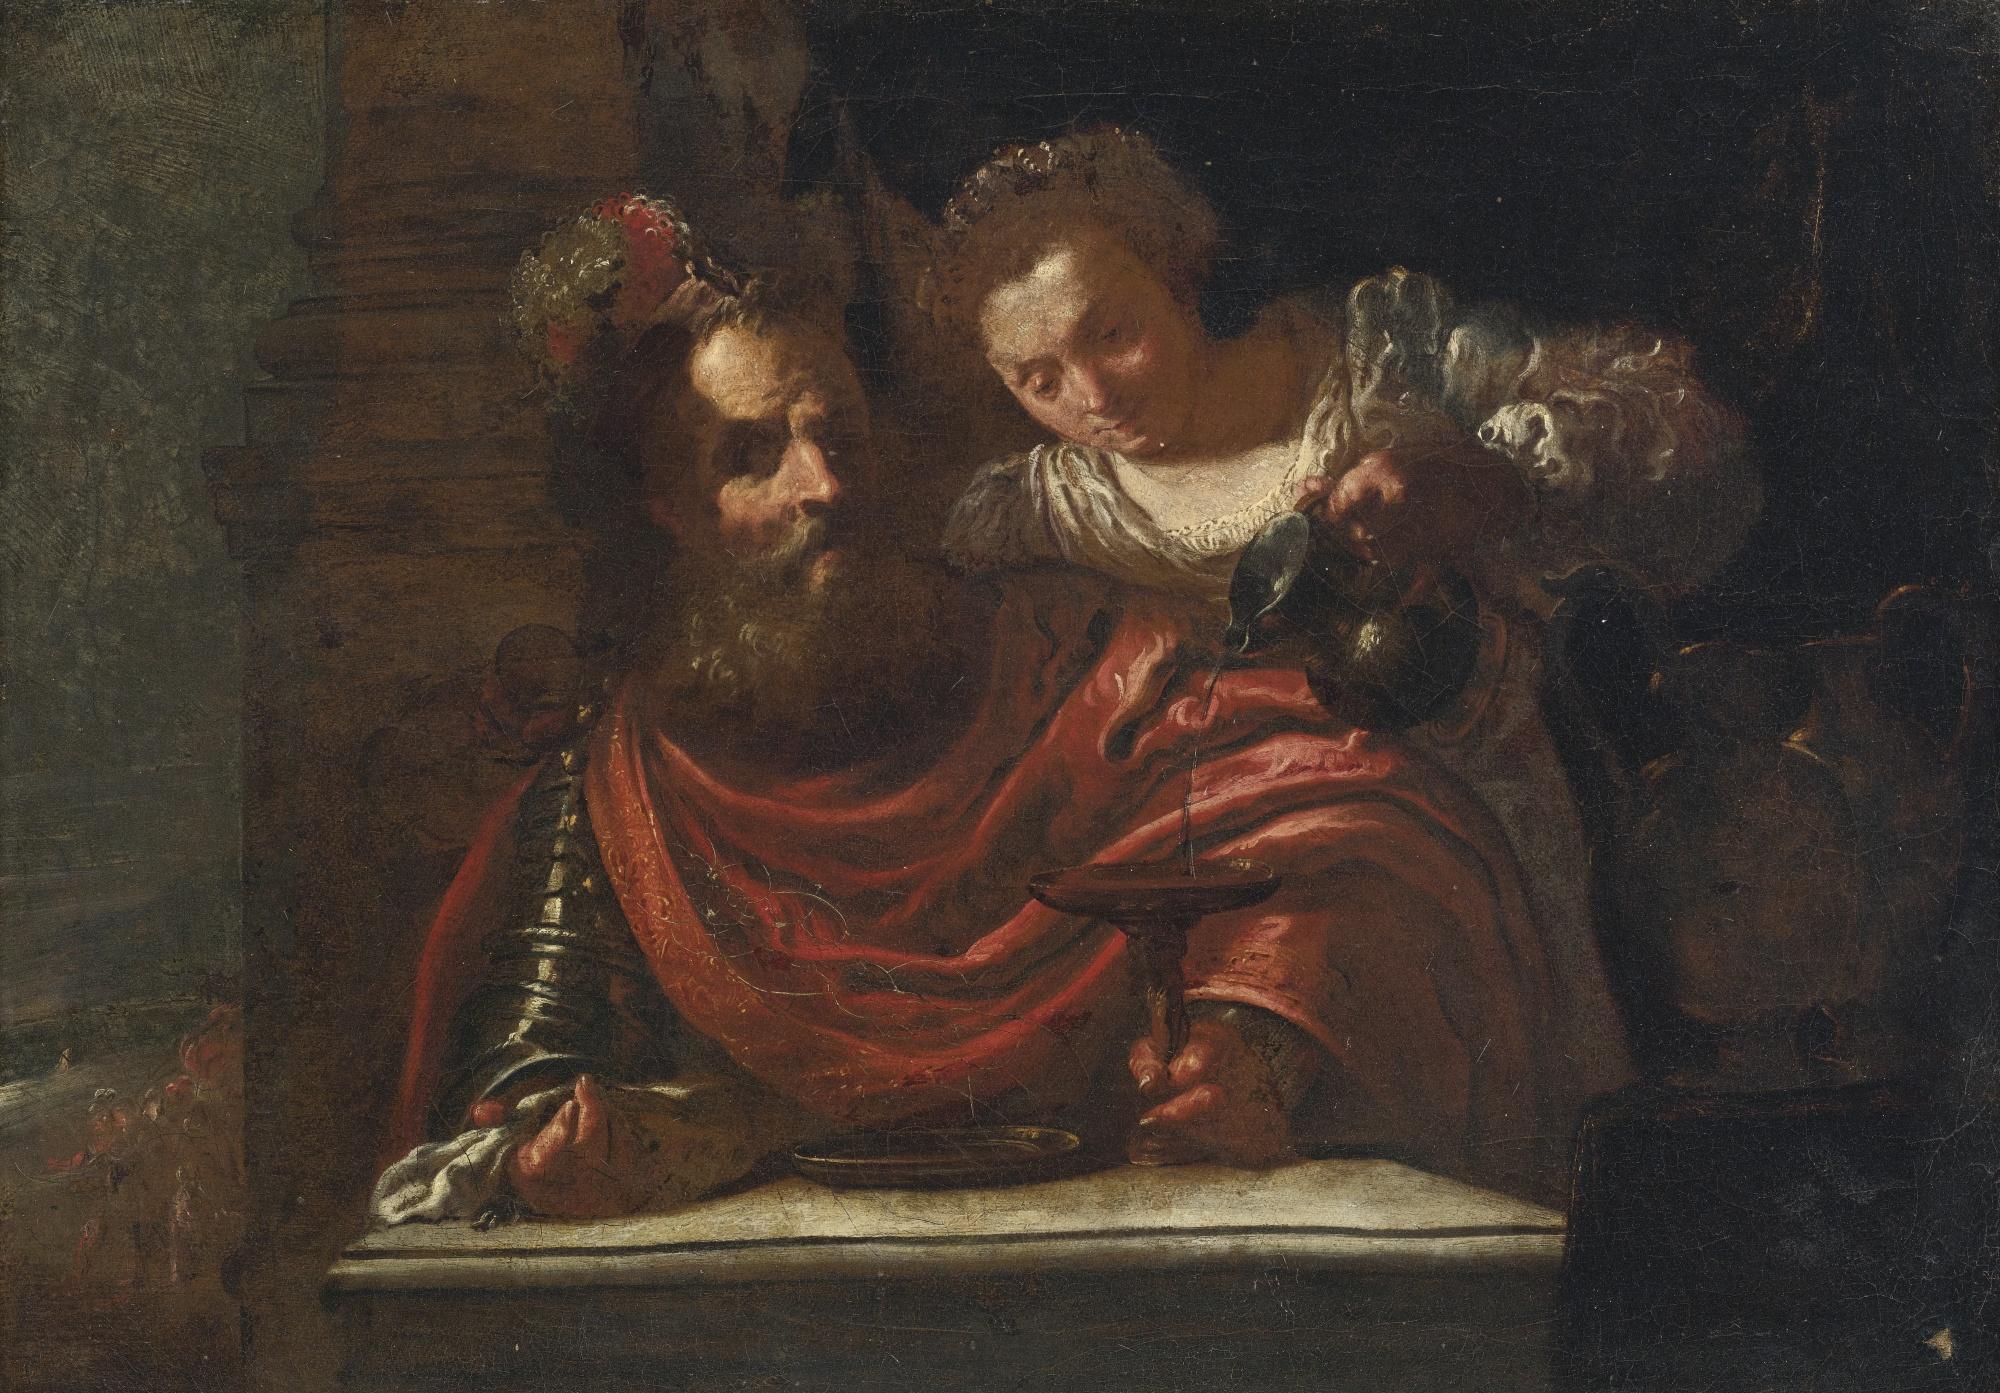 """Un hombre barbudo y una mujer sirviendo vino"" (siglo XVII), de Domenico Fetti"